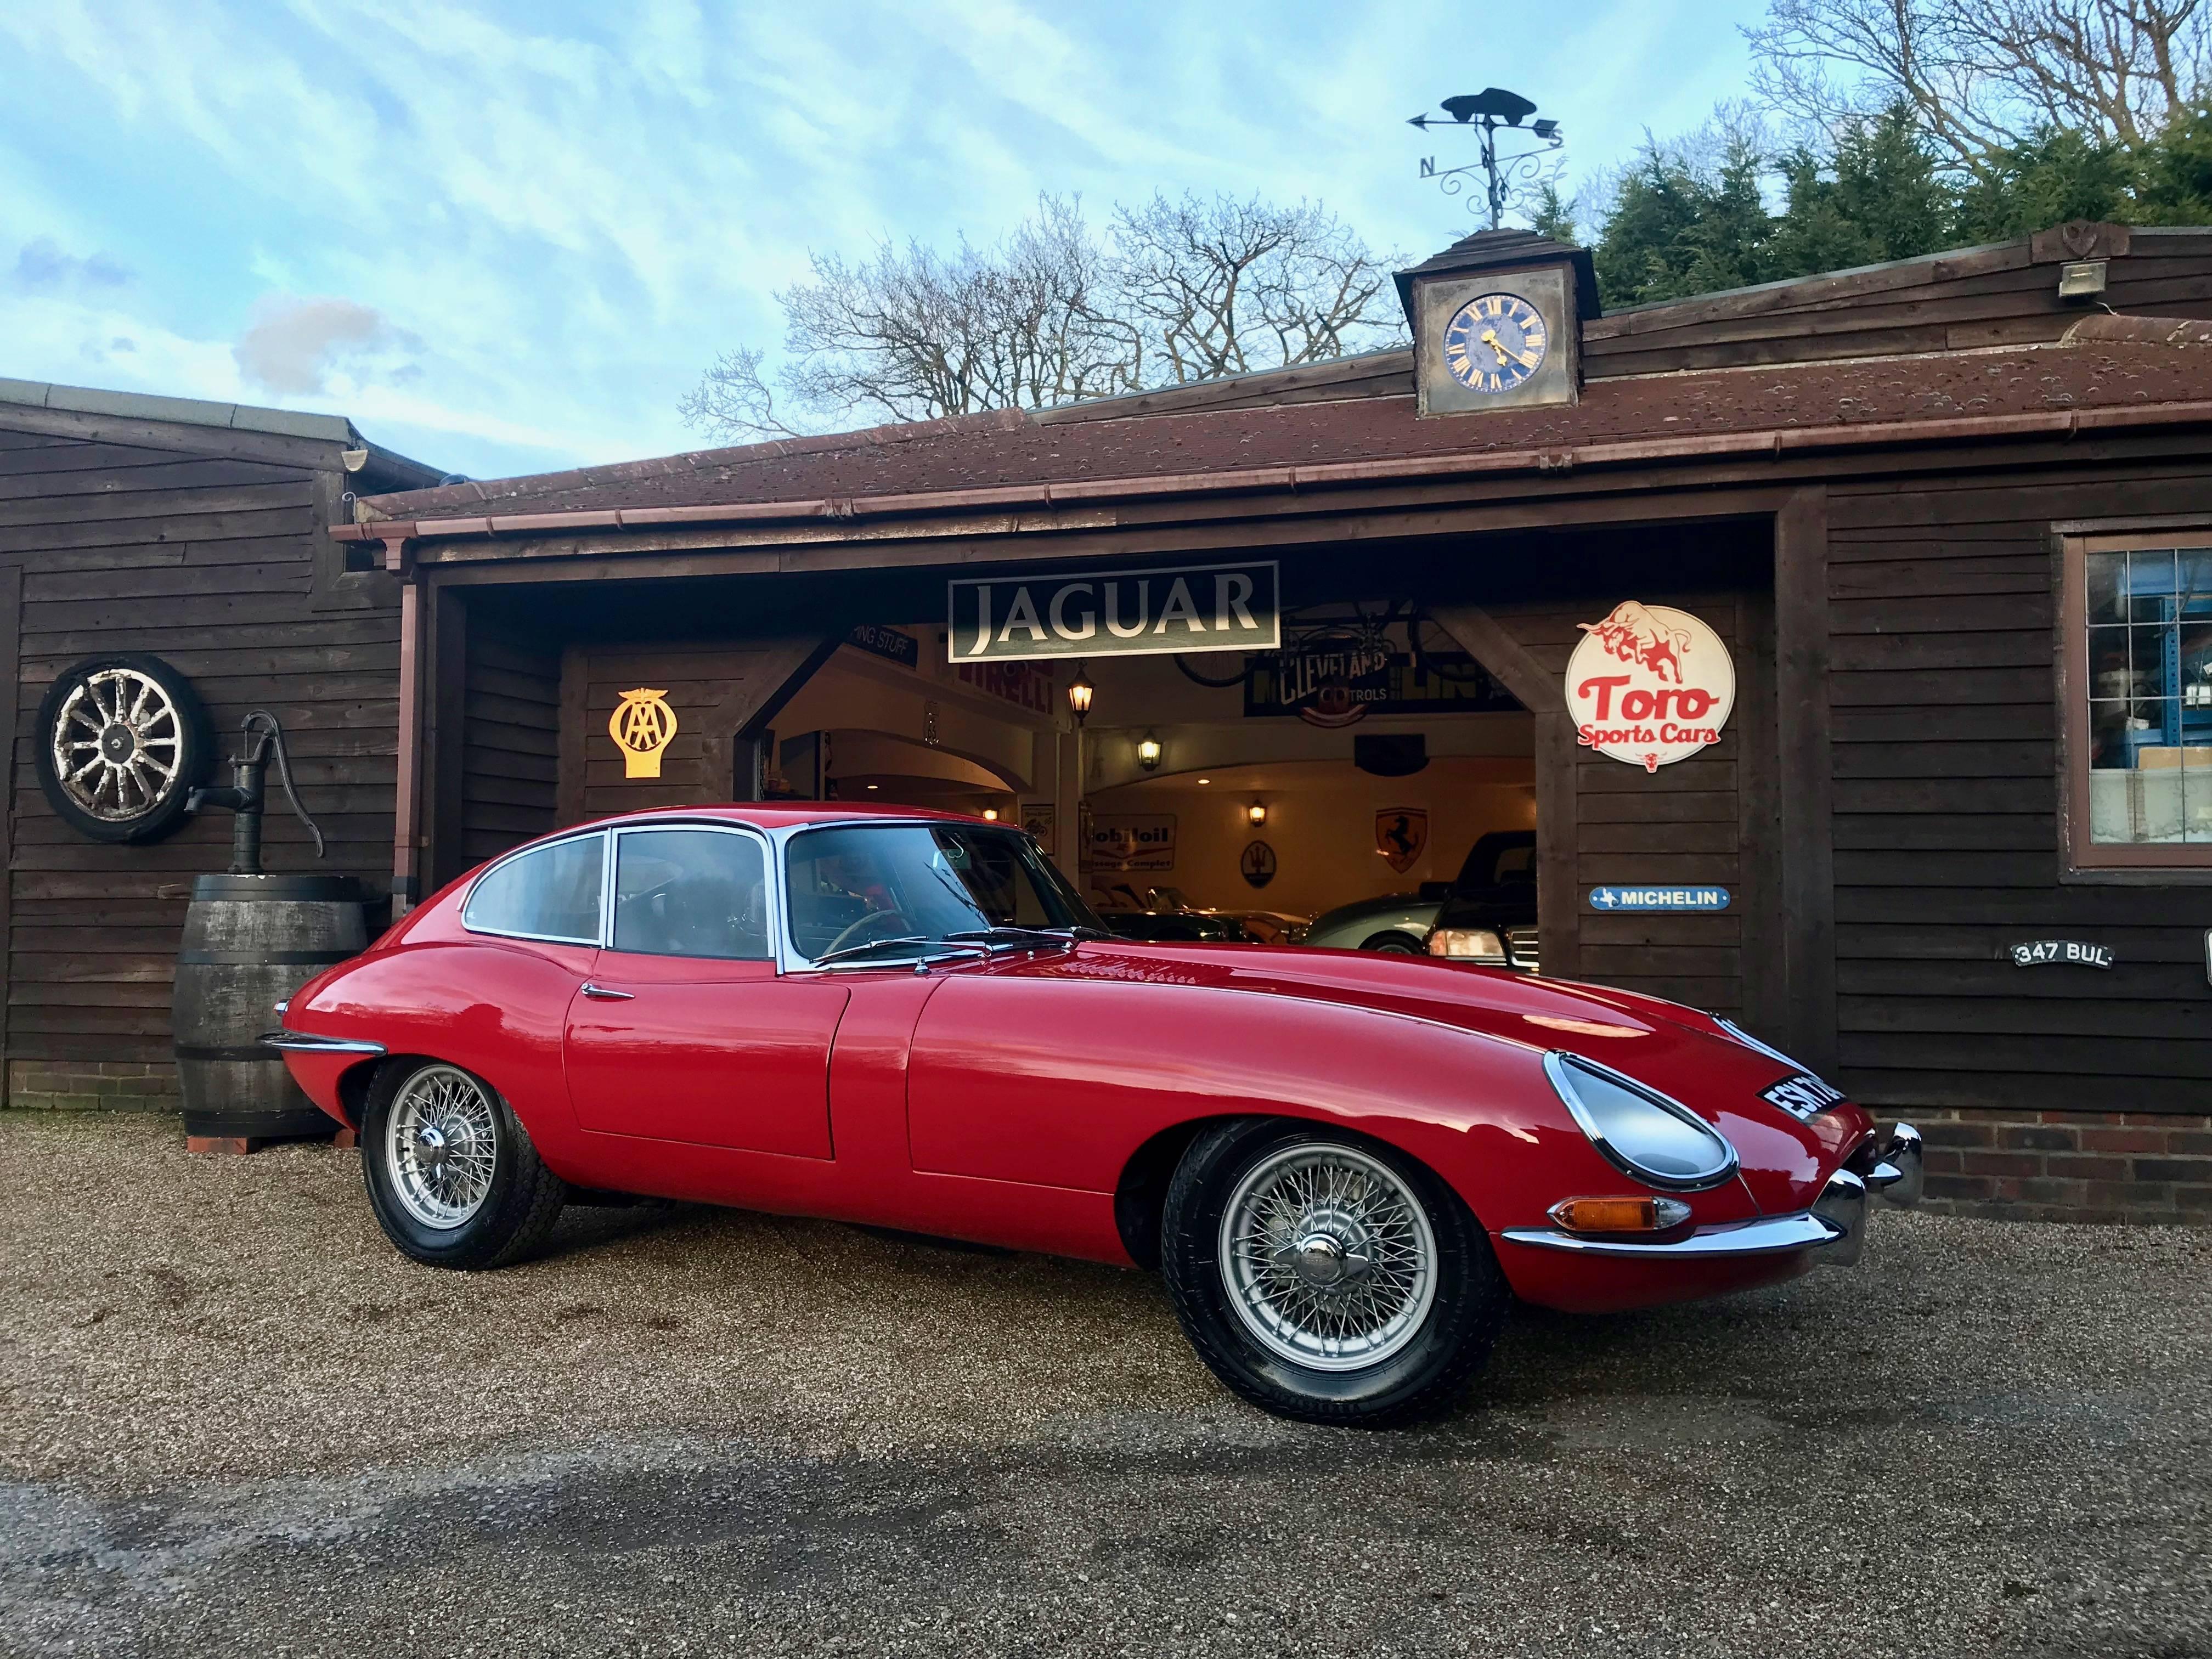 sets com classiccars ward classic sale barn continental for spring docket find park classics journal bentley mulliner jaguar coys